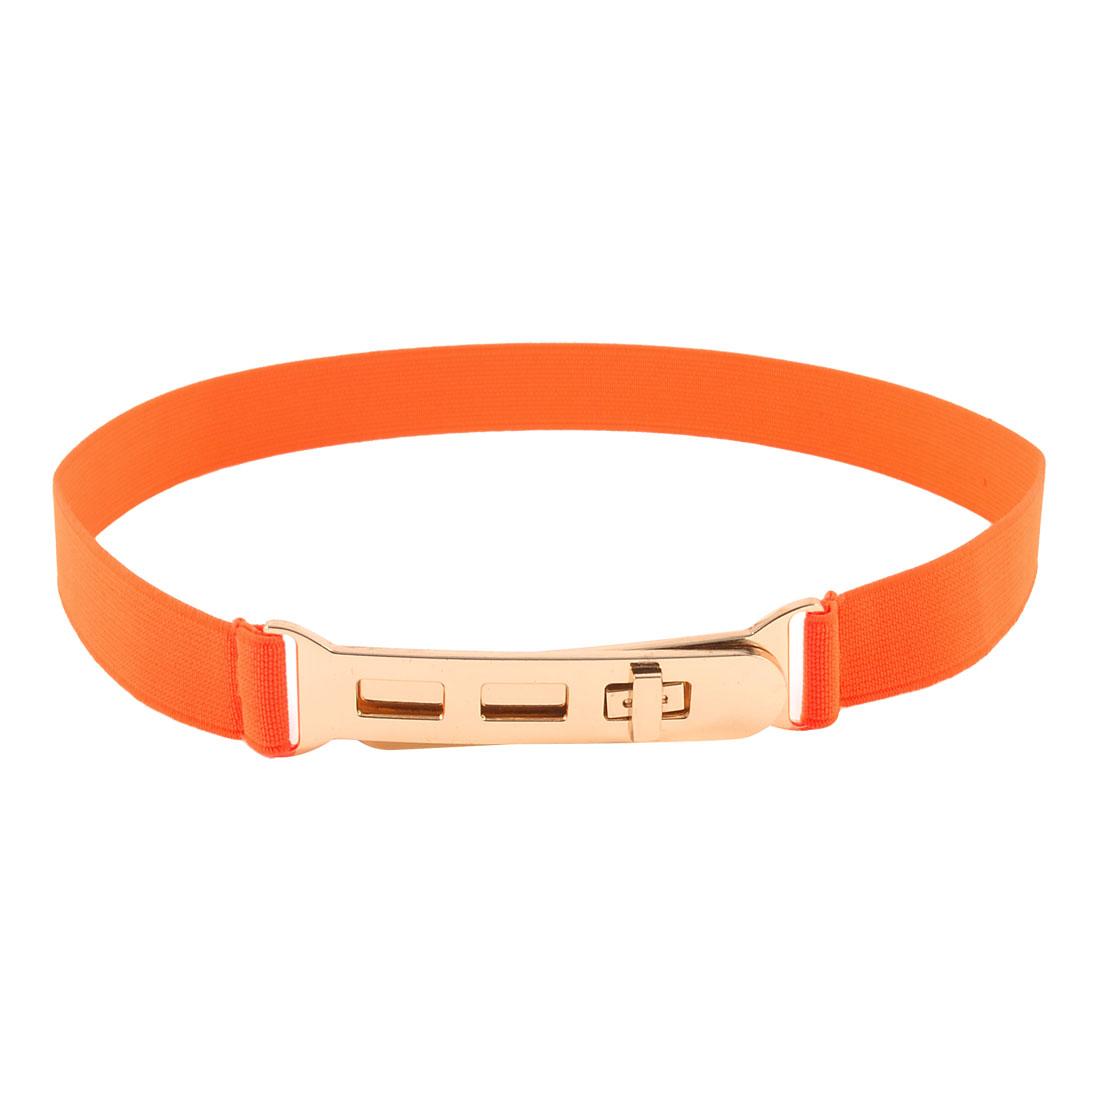 Orange Fabric Elastic Band Copper Tone Buckle Cinch Belt